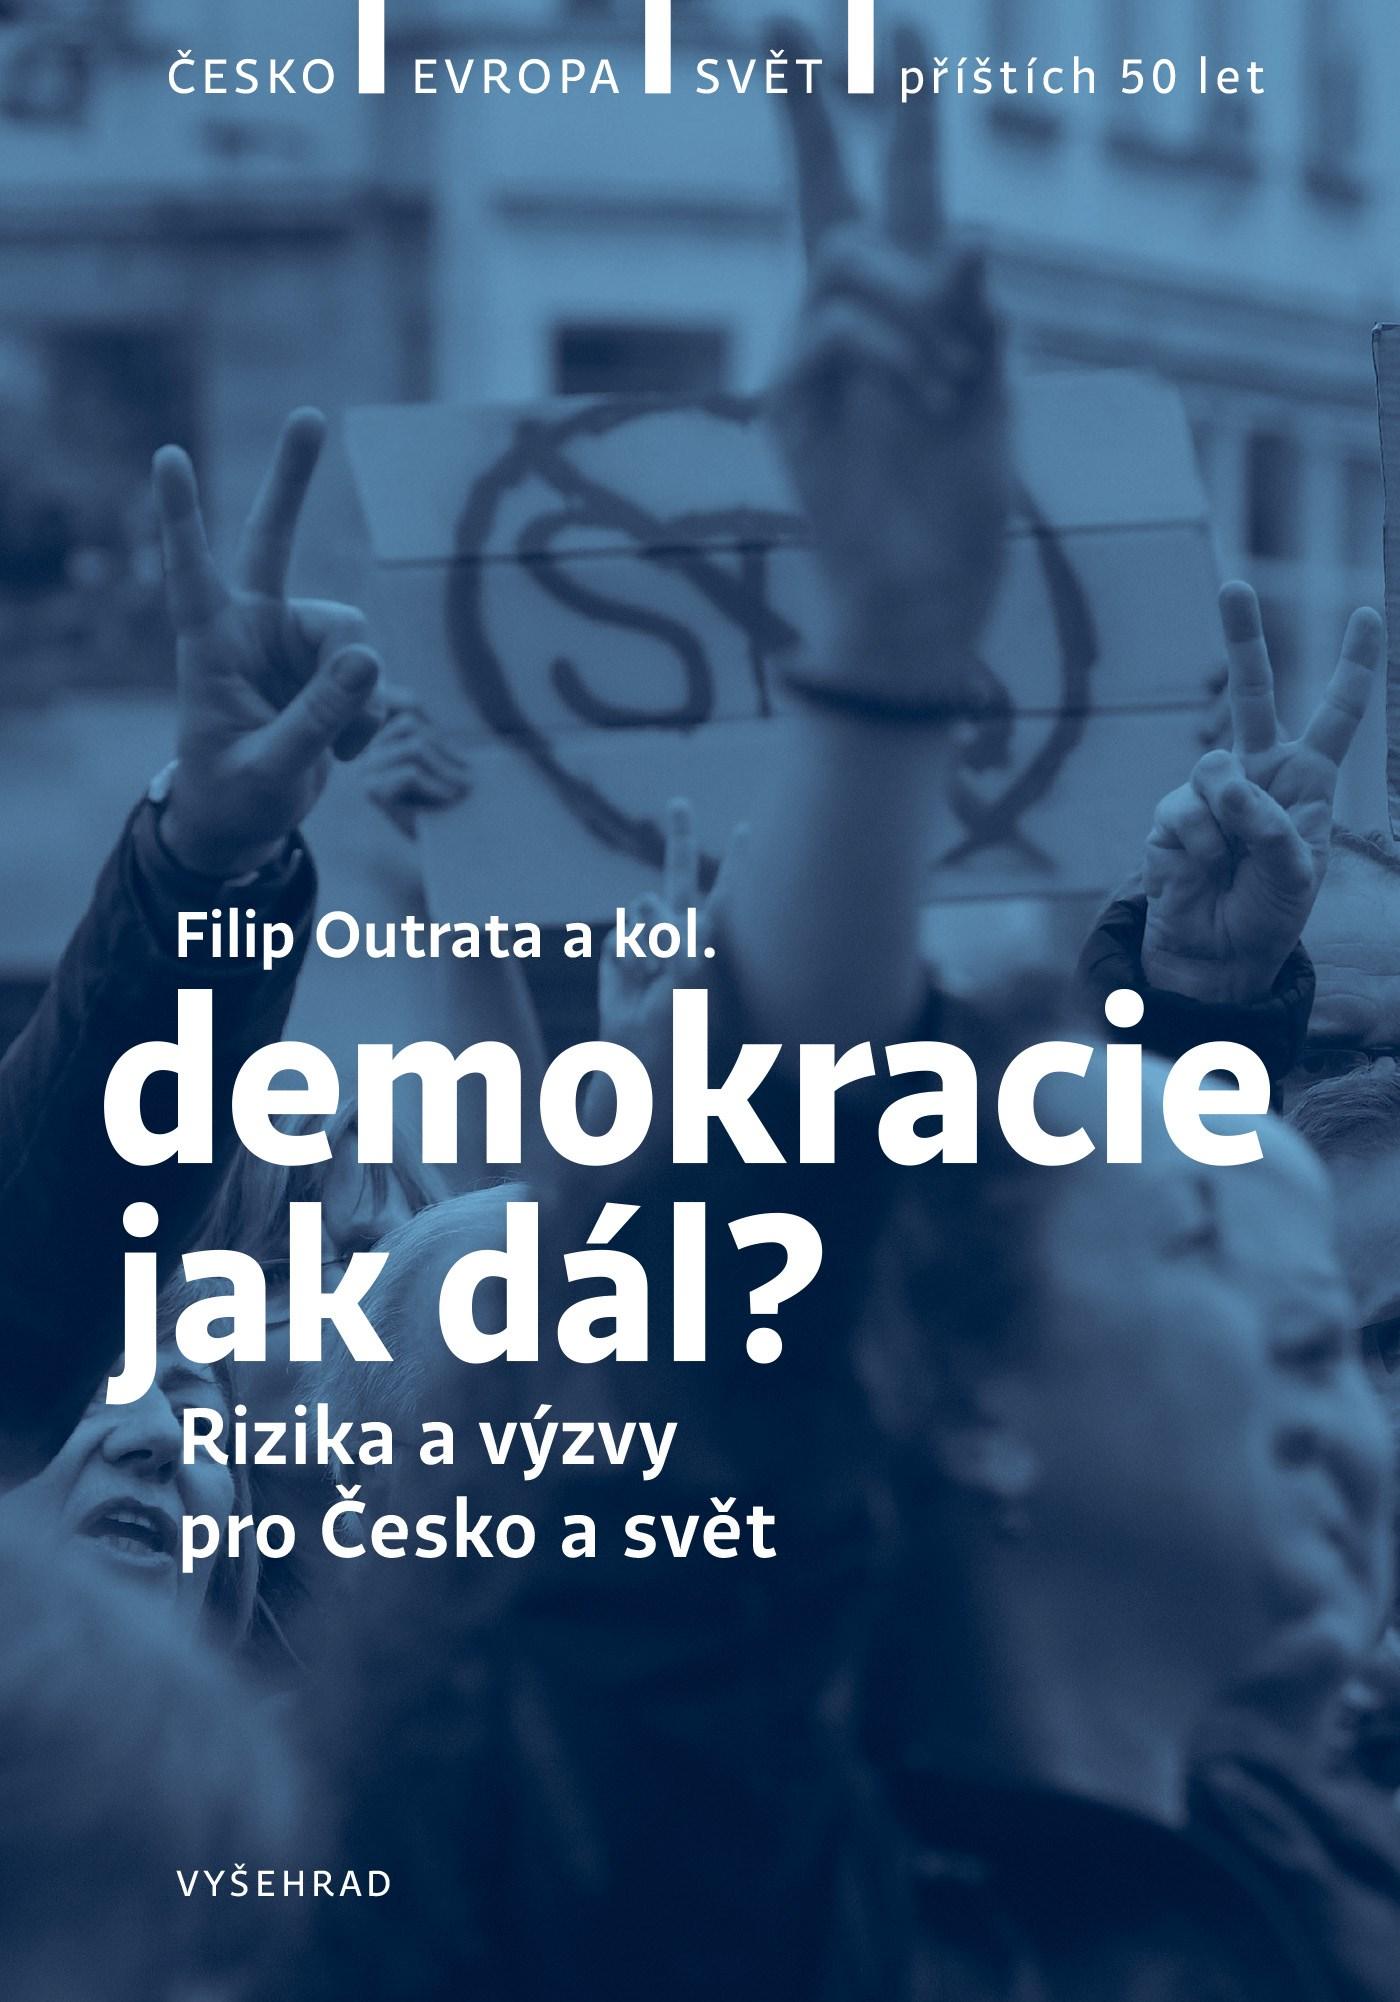 Demokracie_jak_dal